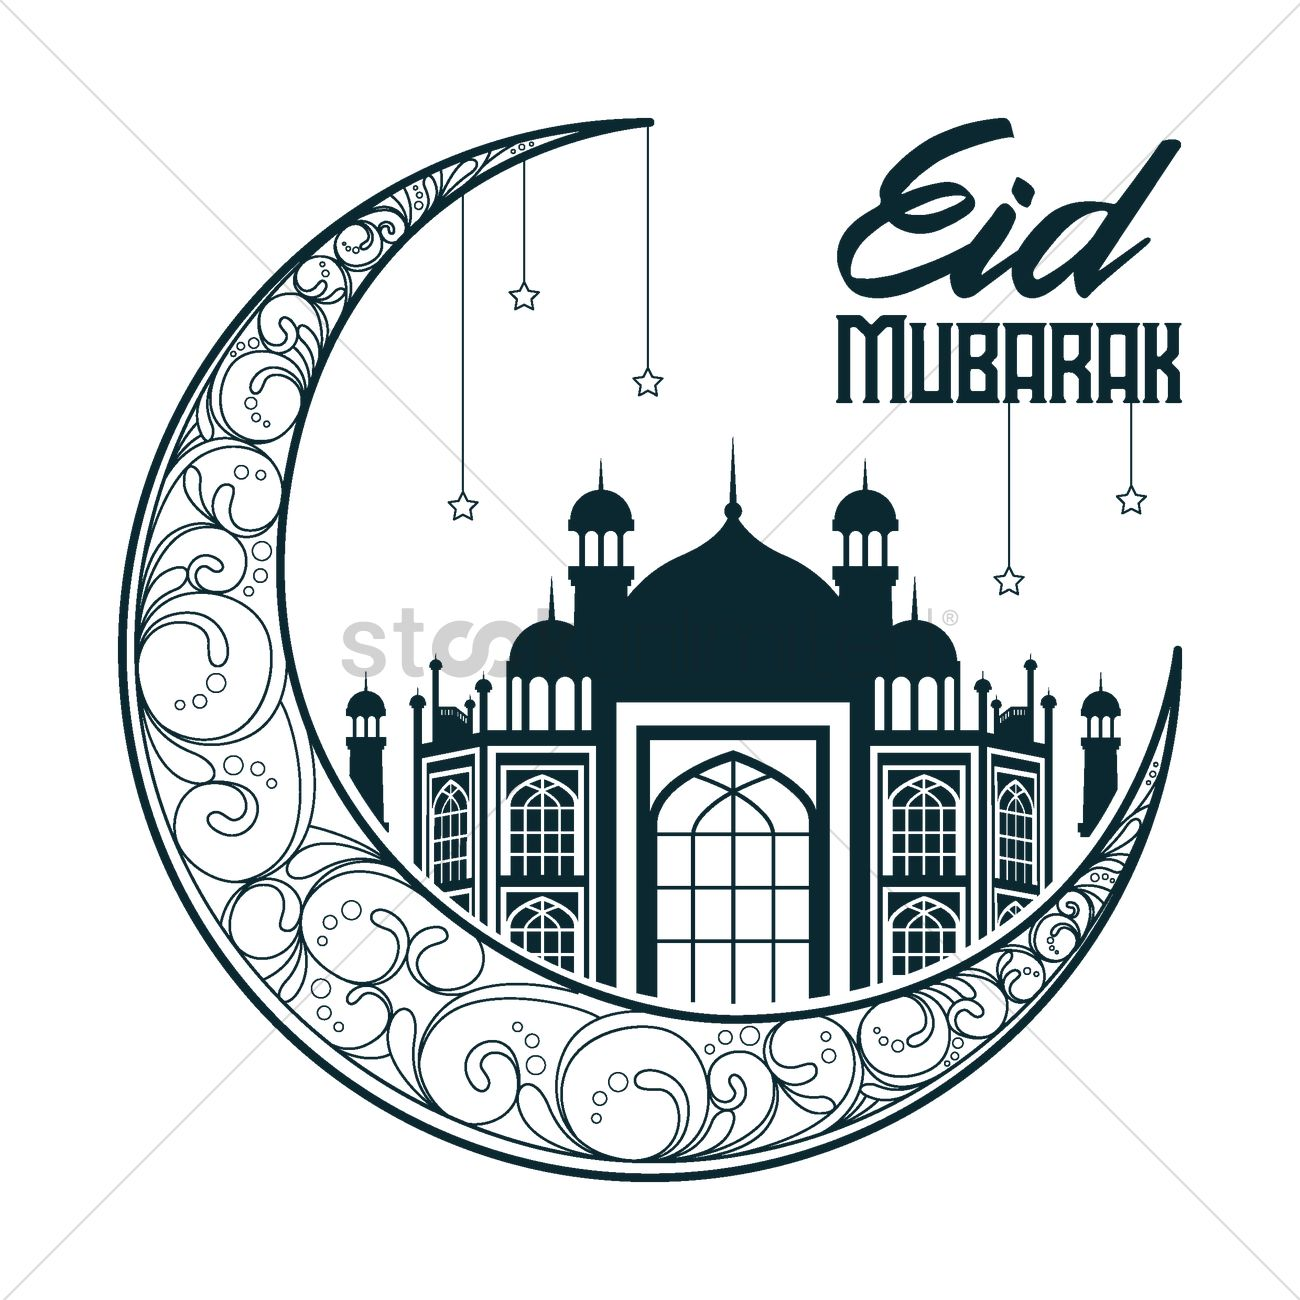 Eid mubarak greetings Vector Image.